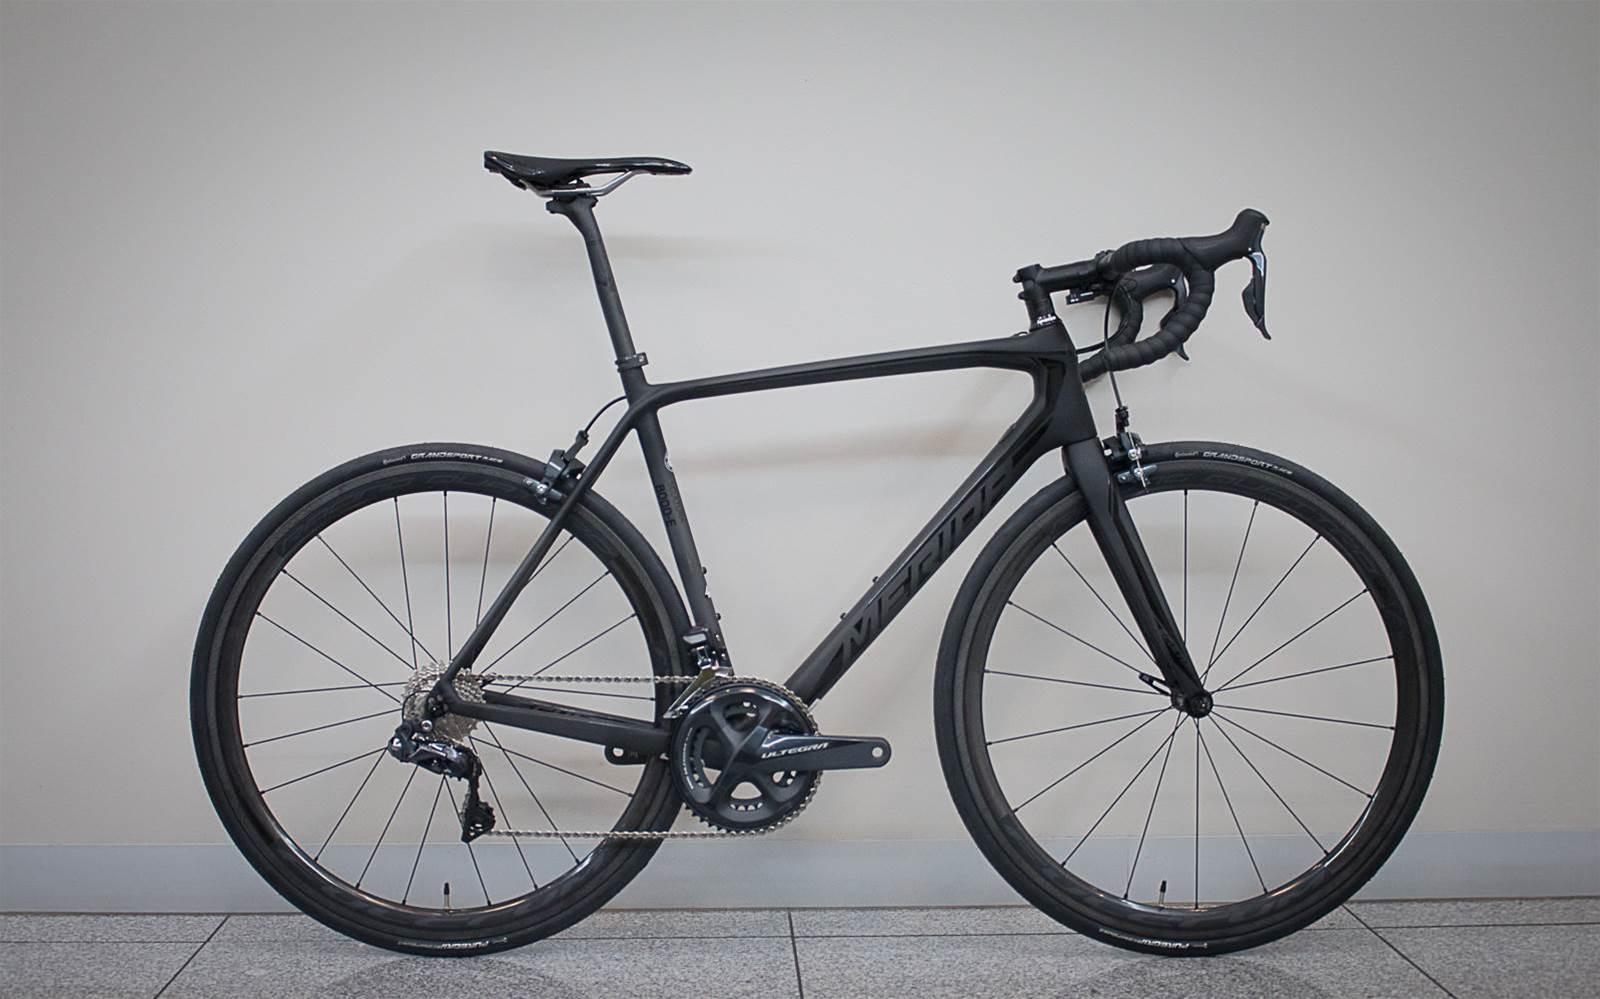 Merida's road bikes for 2018